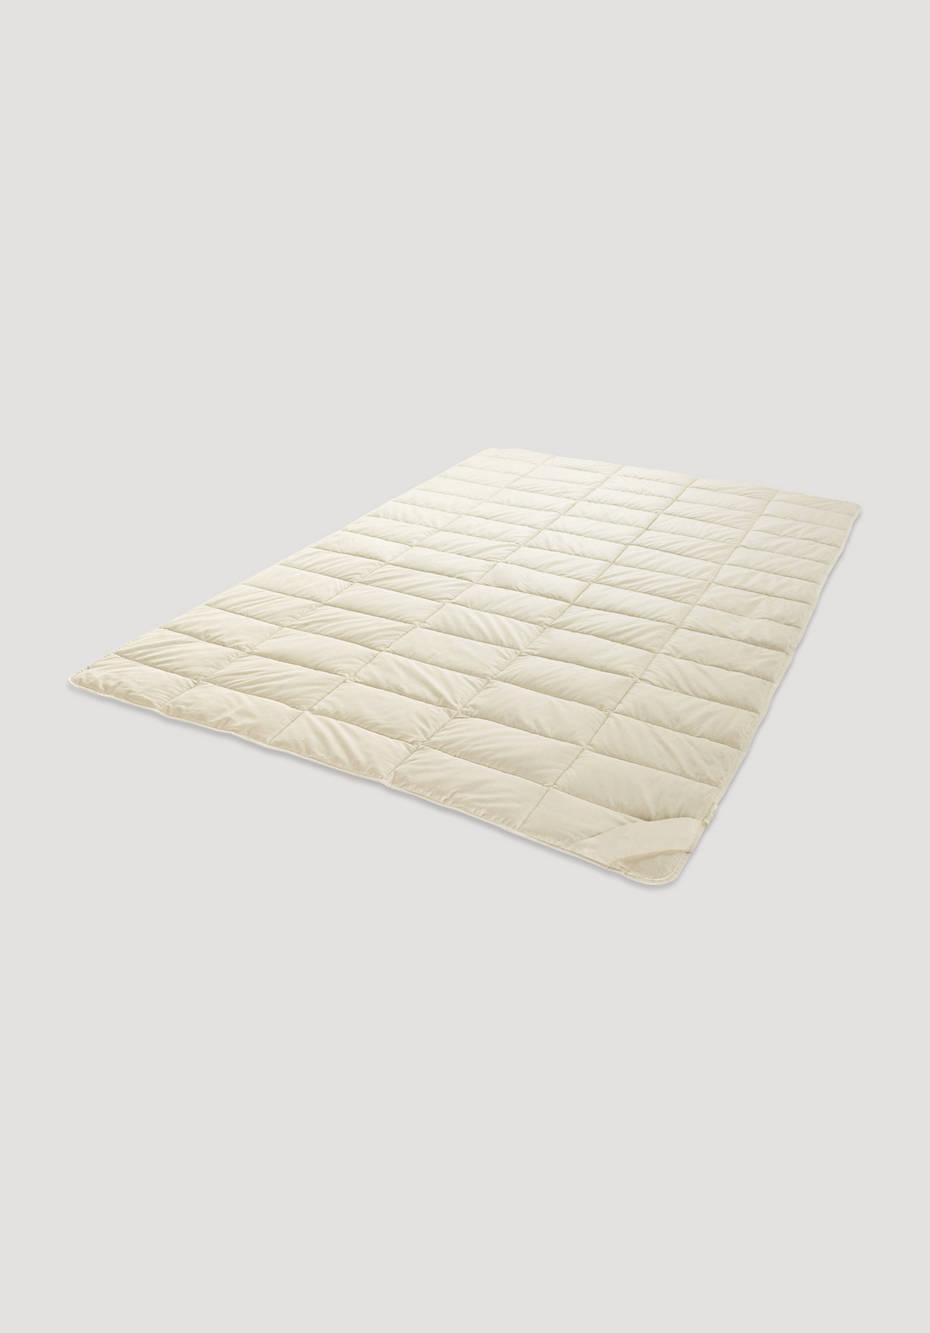 Lightweight summer blanket made of linen with organic cotton